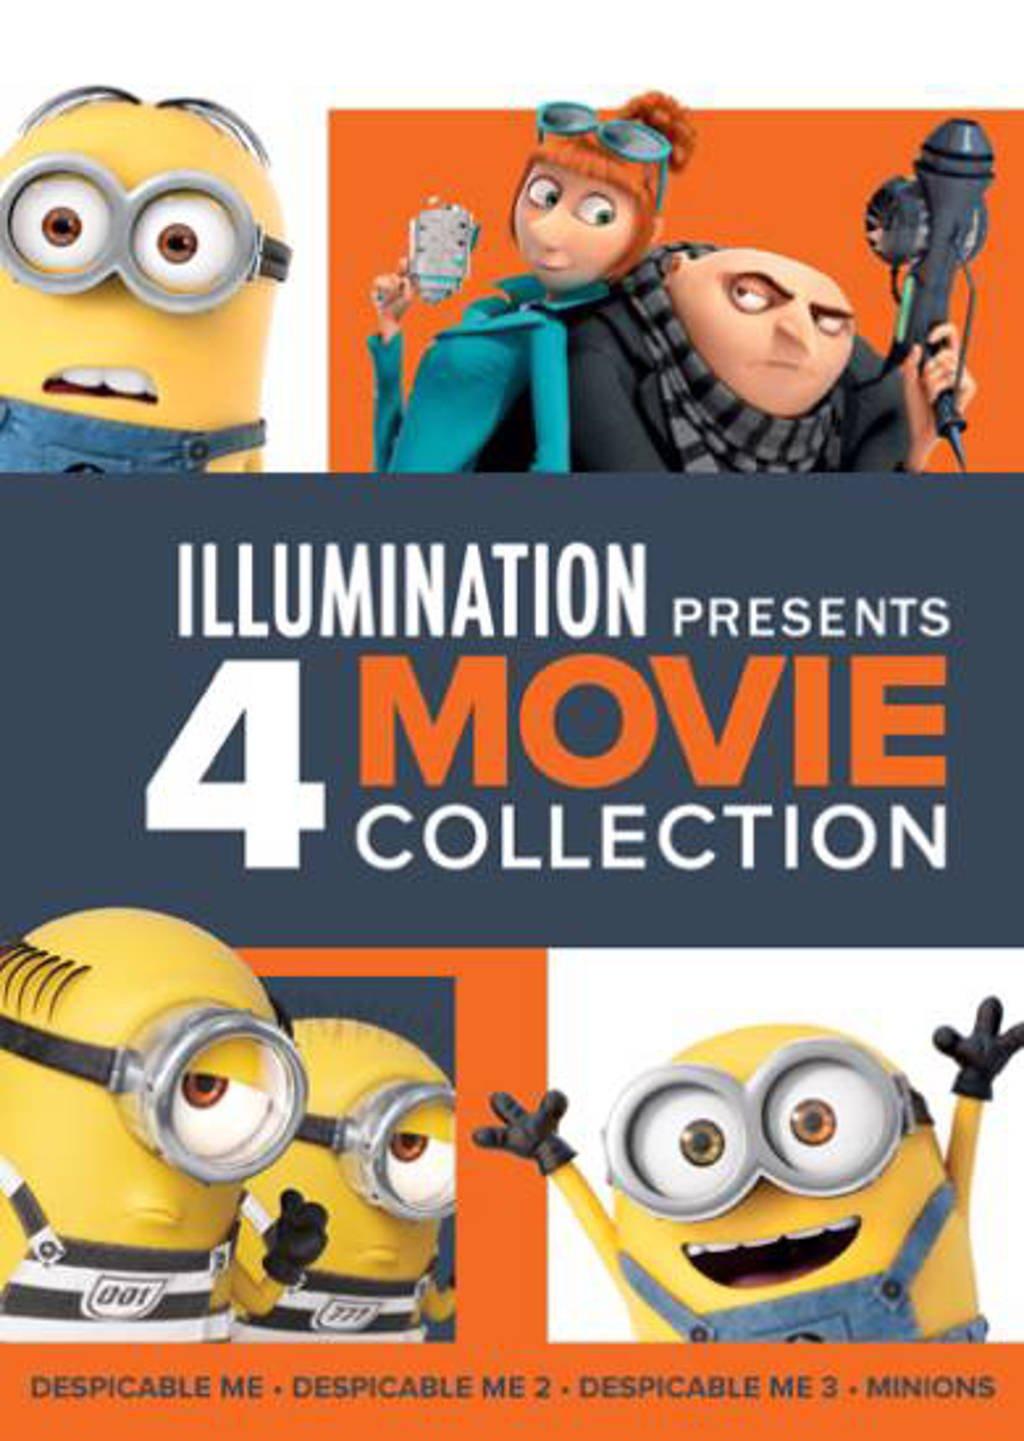 Verschrikkelijke ikke 1-3 & Minions (Despicable me 1-3 & Minions) (DVD)